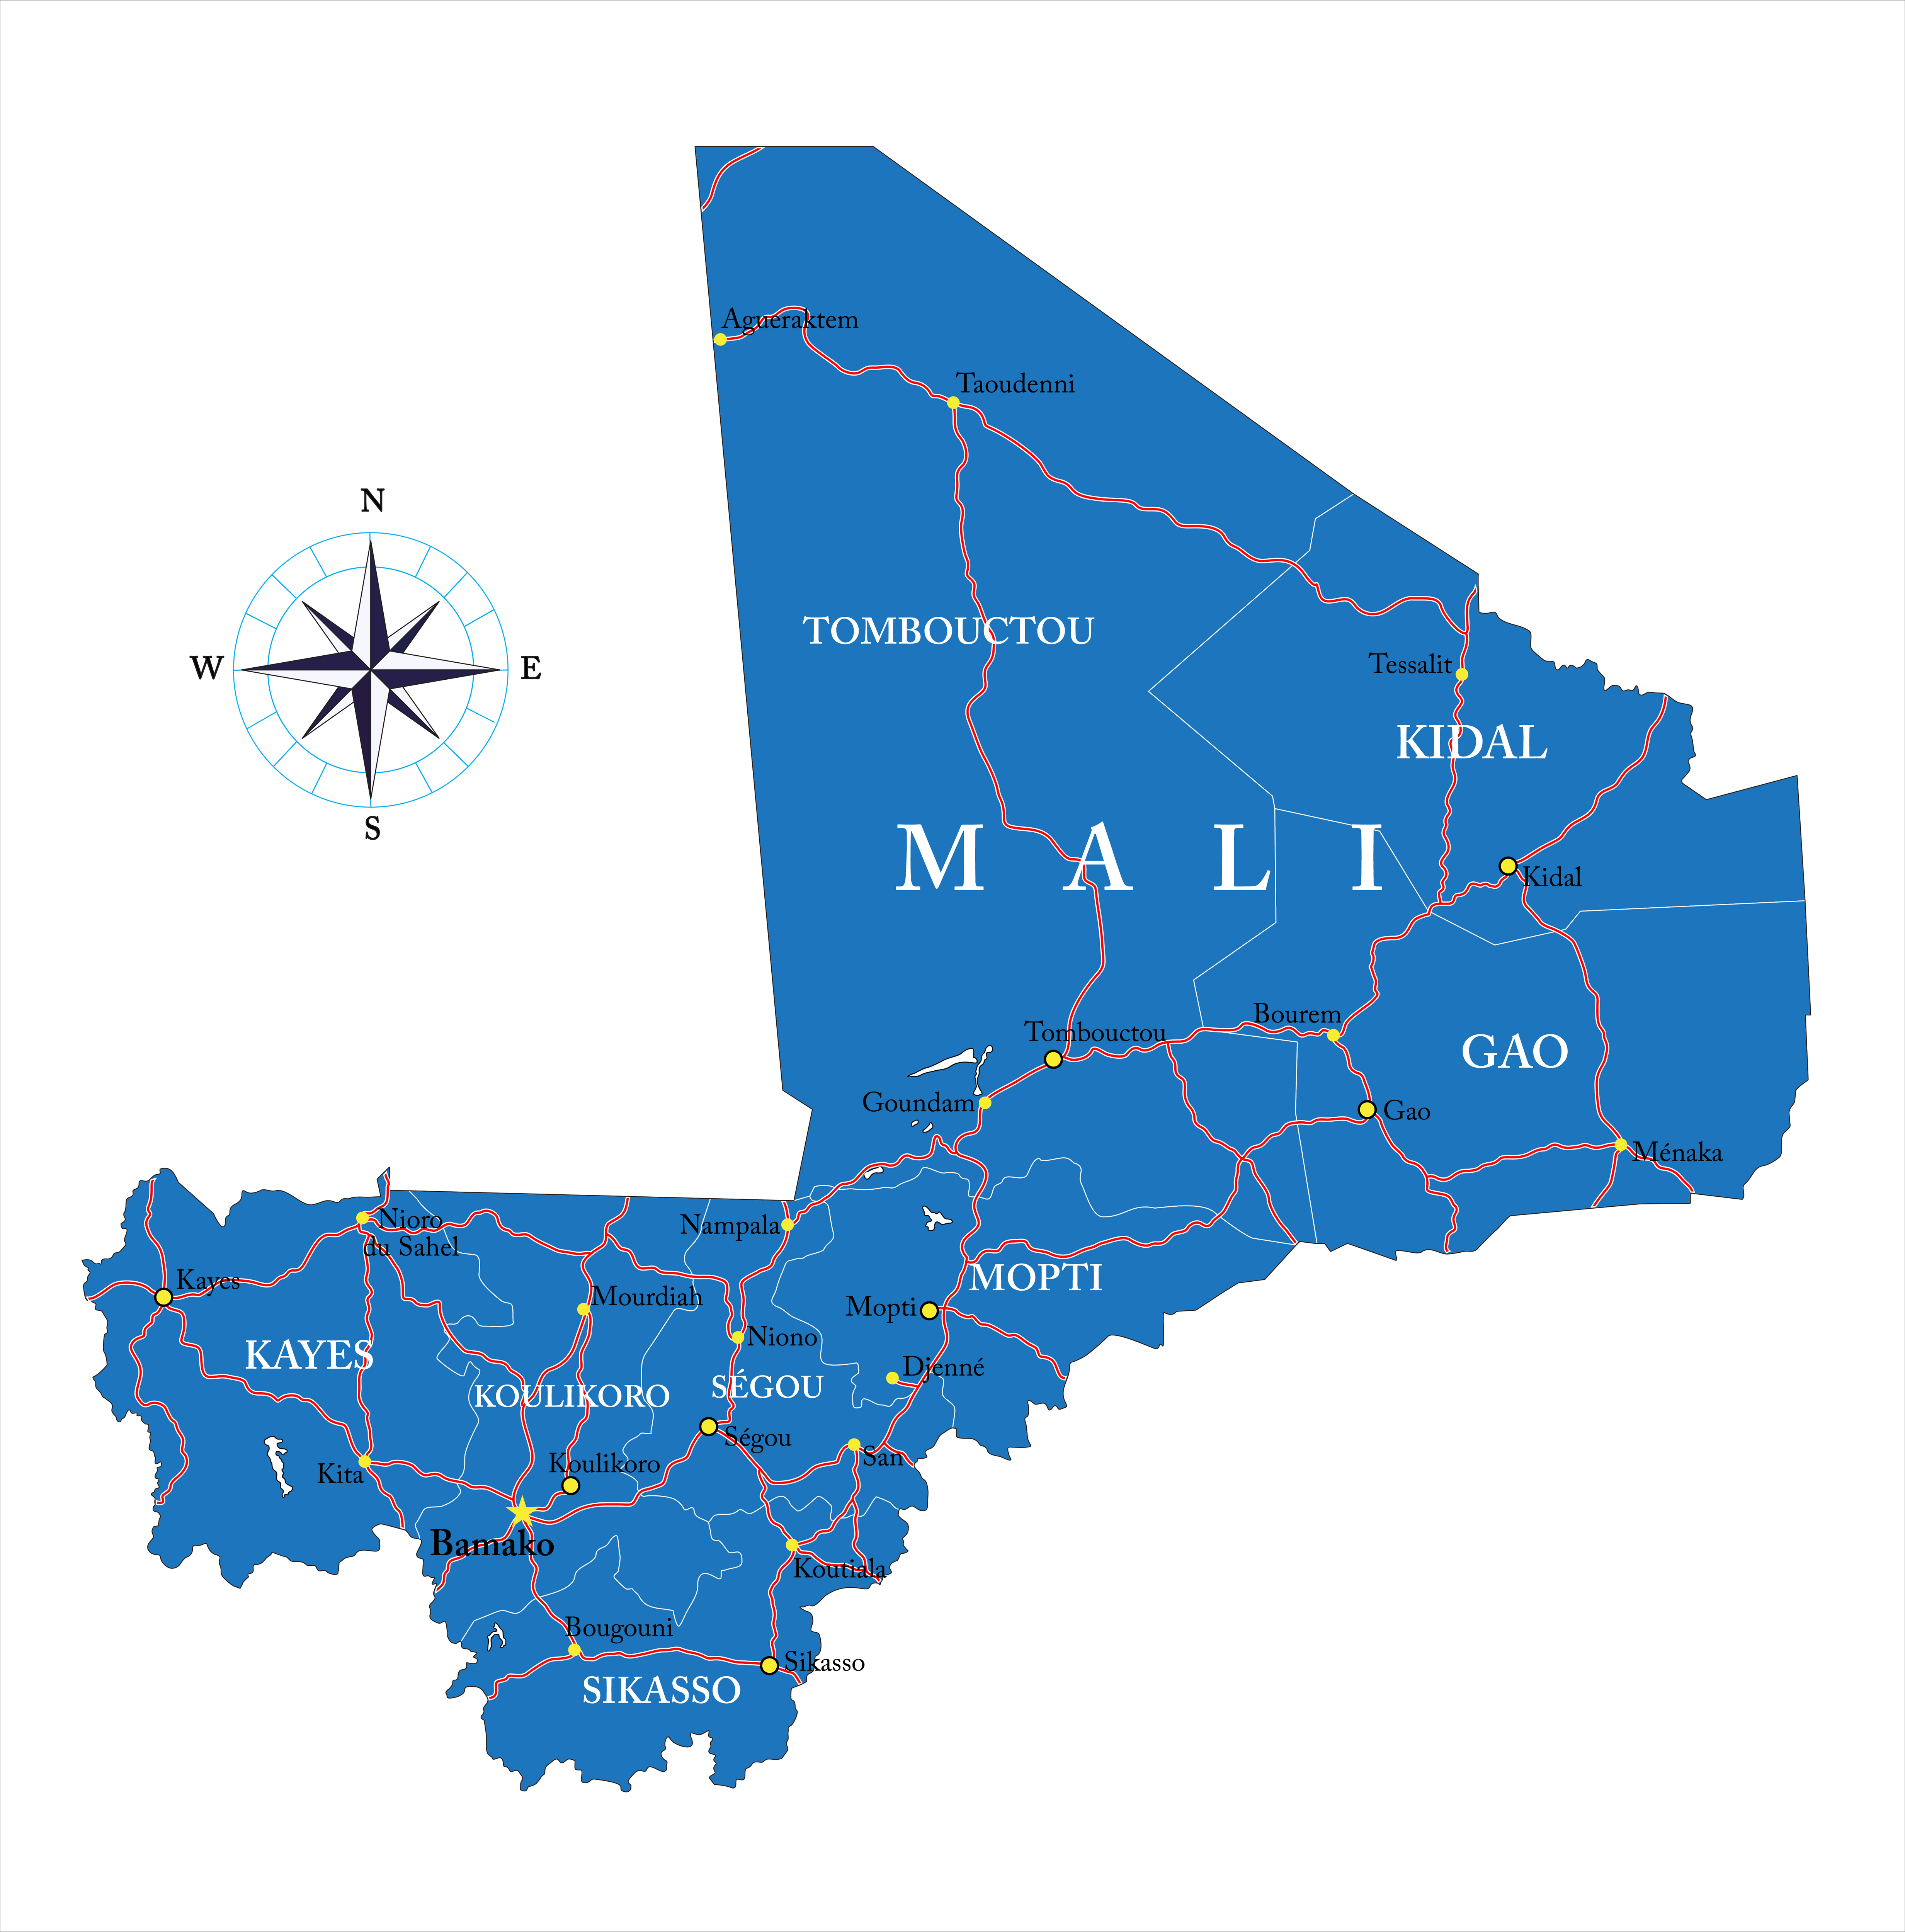 Map of Mali. Image courtesy of DollarPhotoClub.com